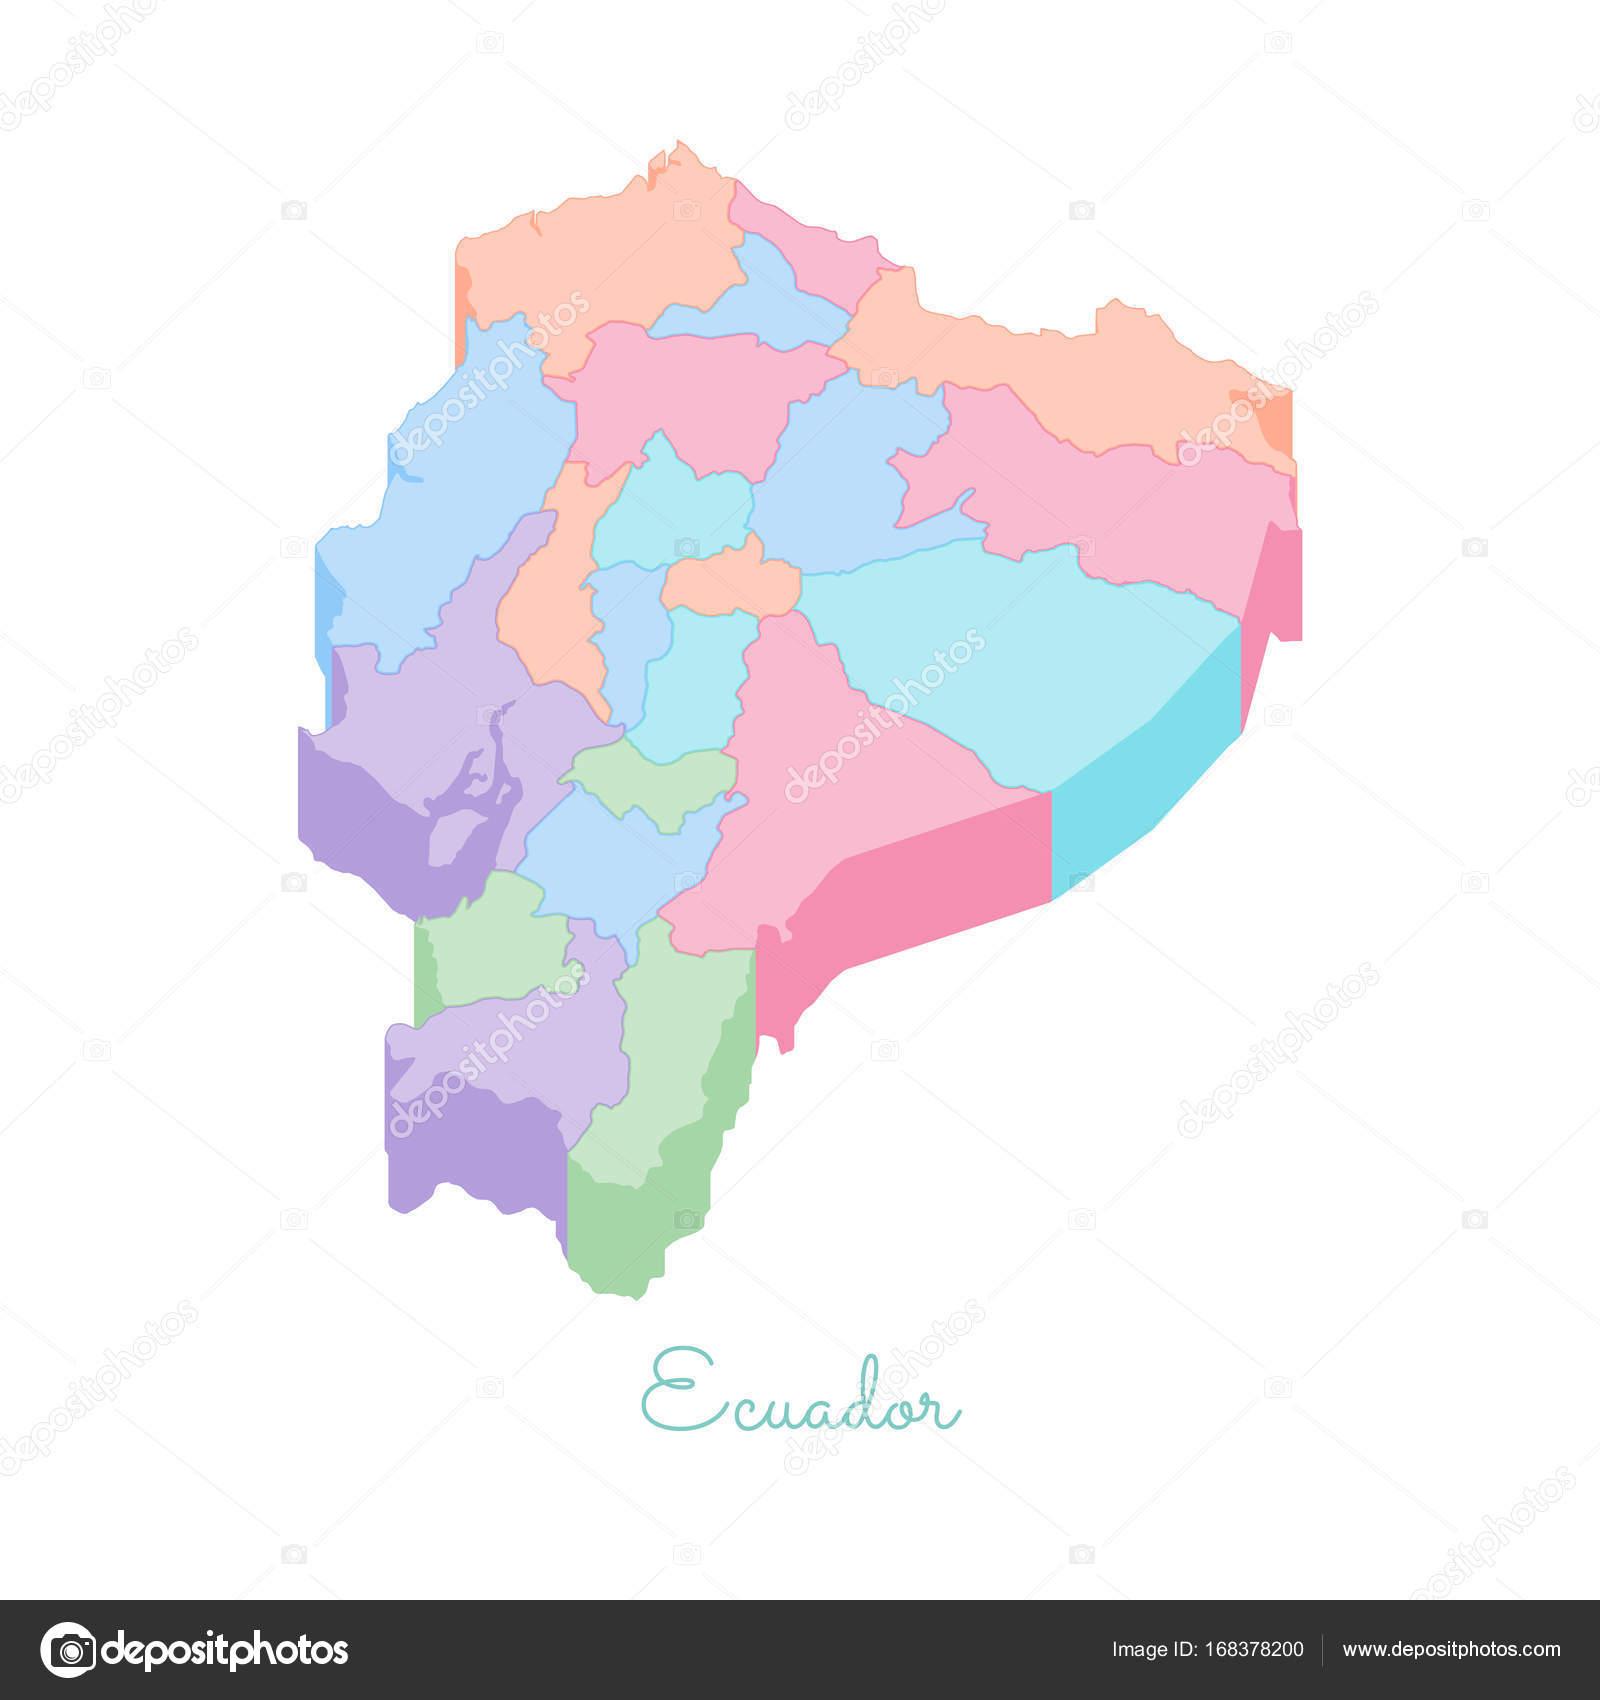 Ecuador regi n mapa colorido superior vista isom trica for Provincia sudafricana con durban